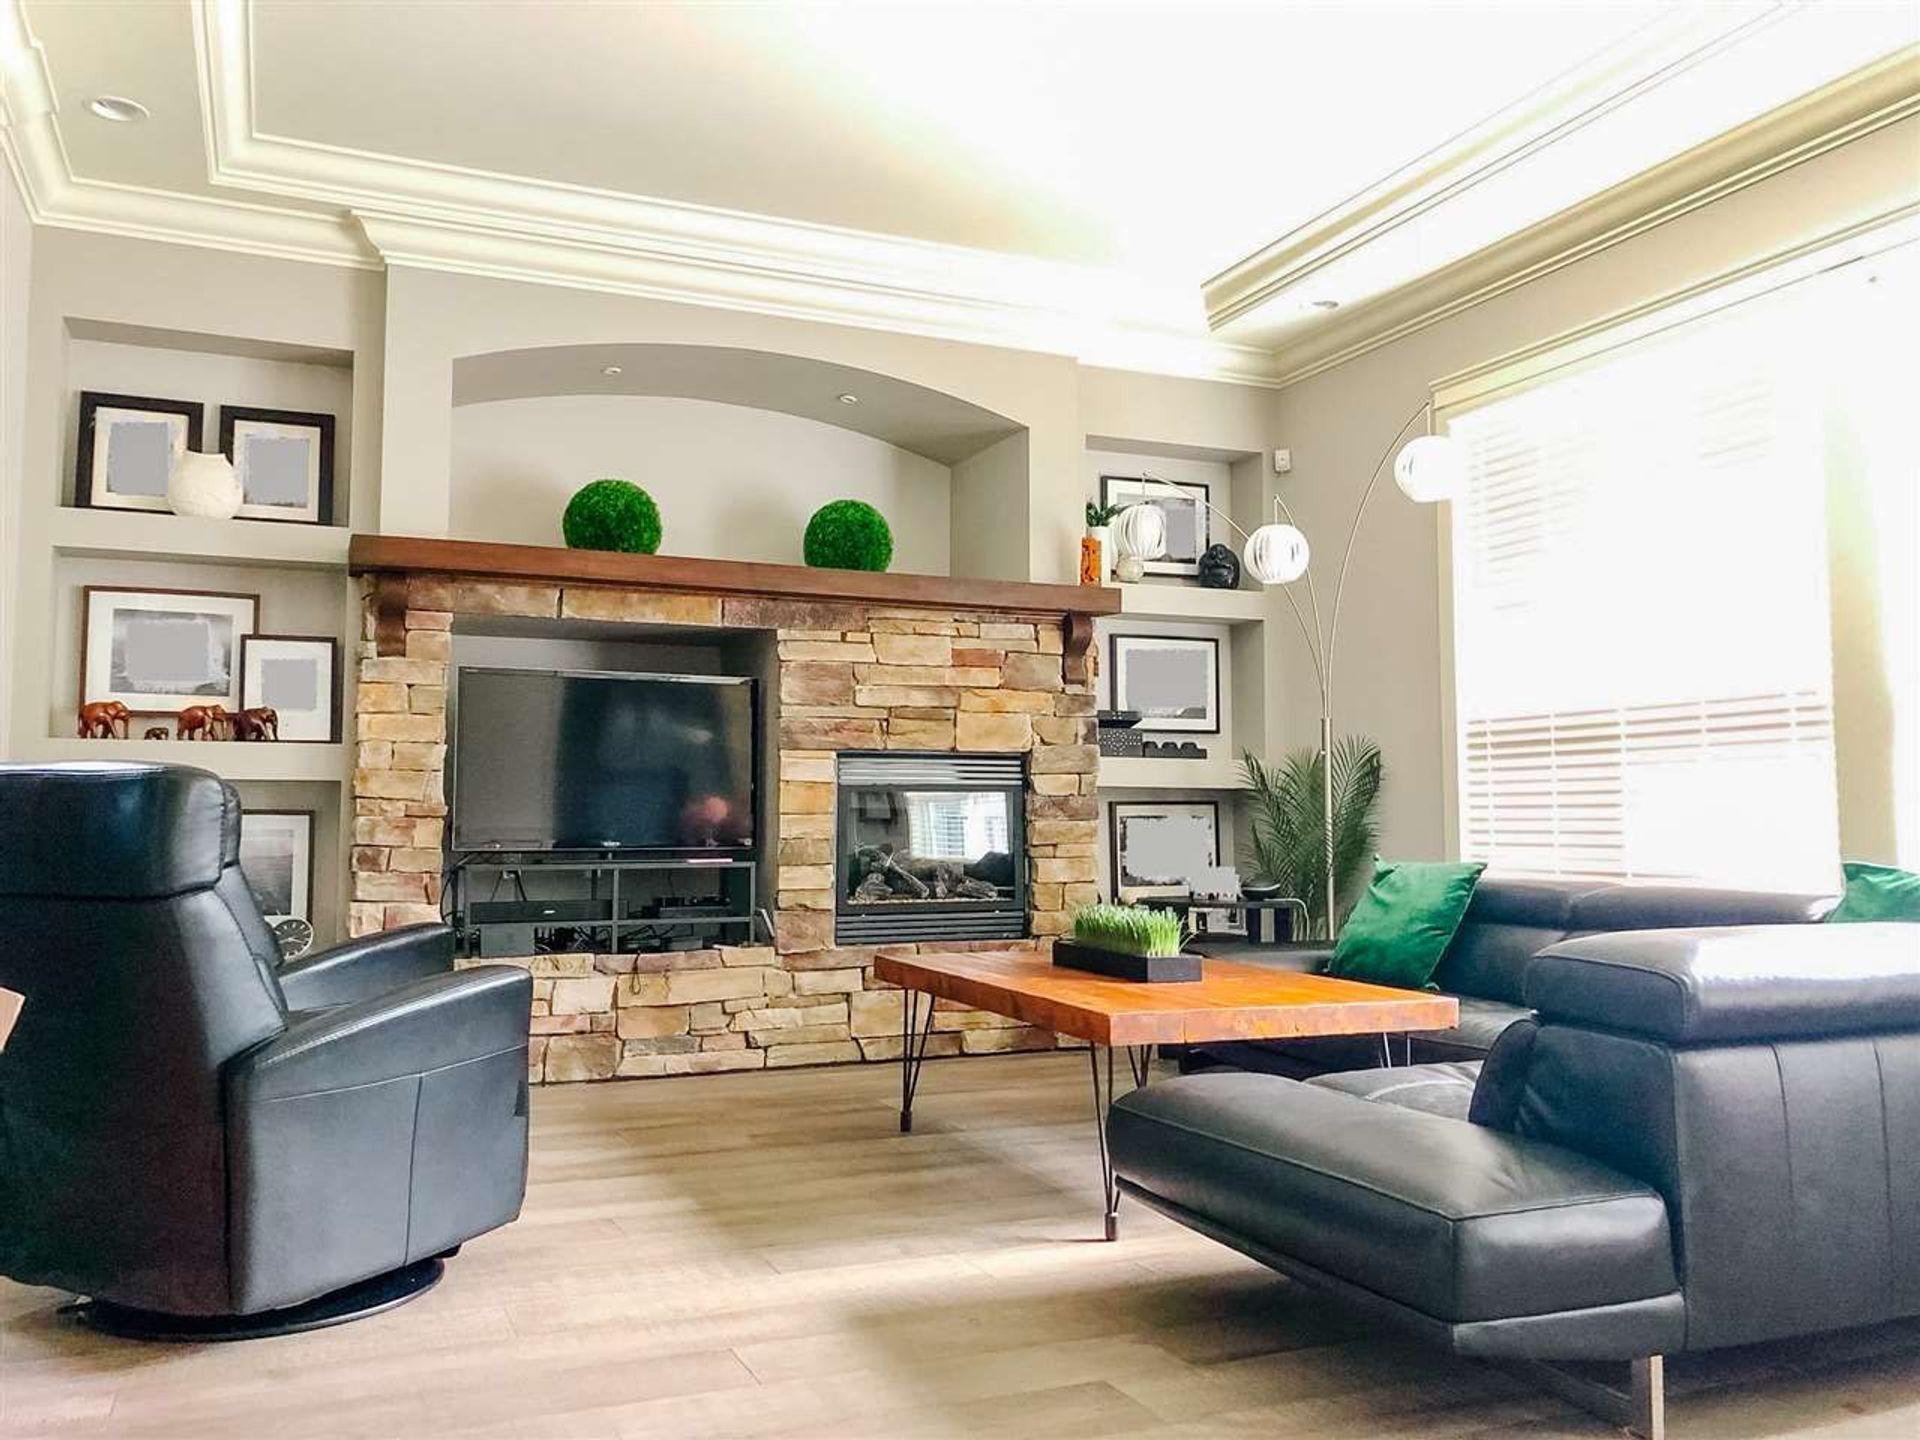 2580-162-street-grandview-surrey-south-surrey-white-rock-10 at 2580 162 Street, Grandview Surrey, South Surrey White Rock